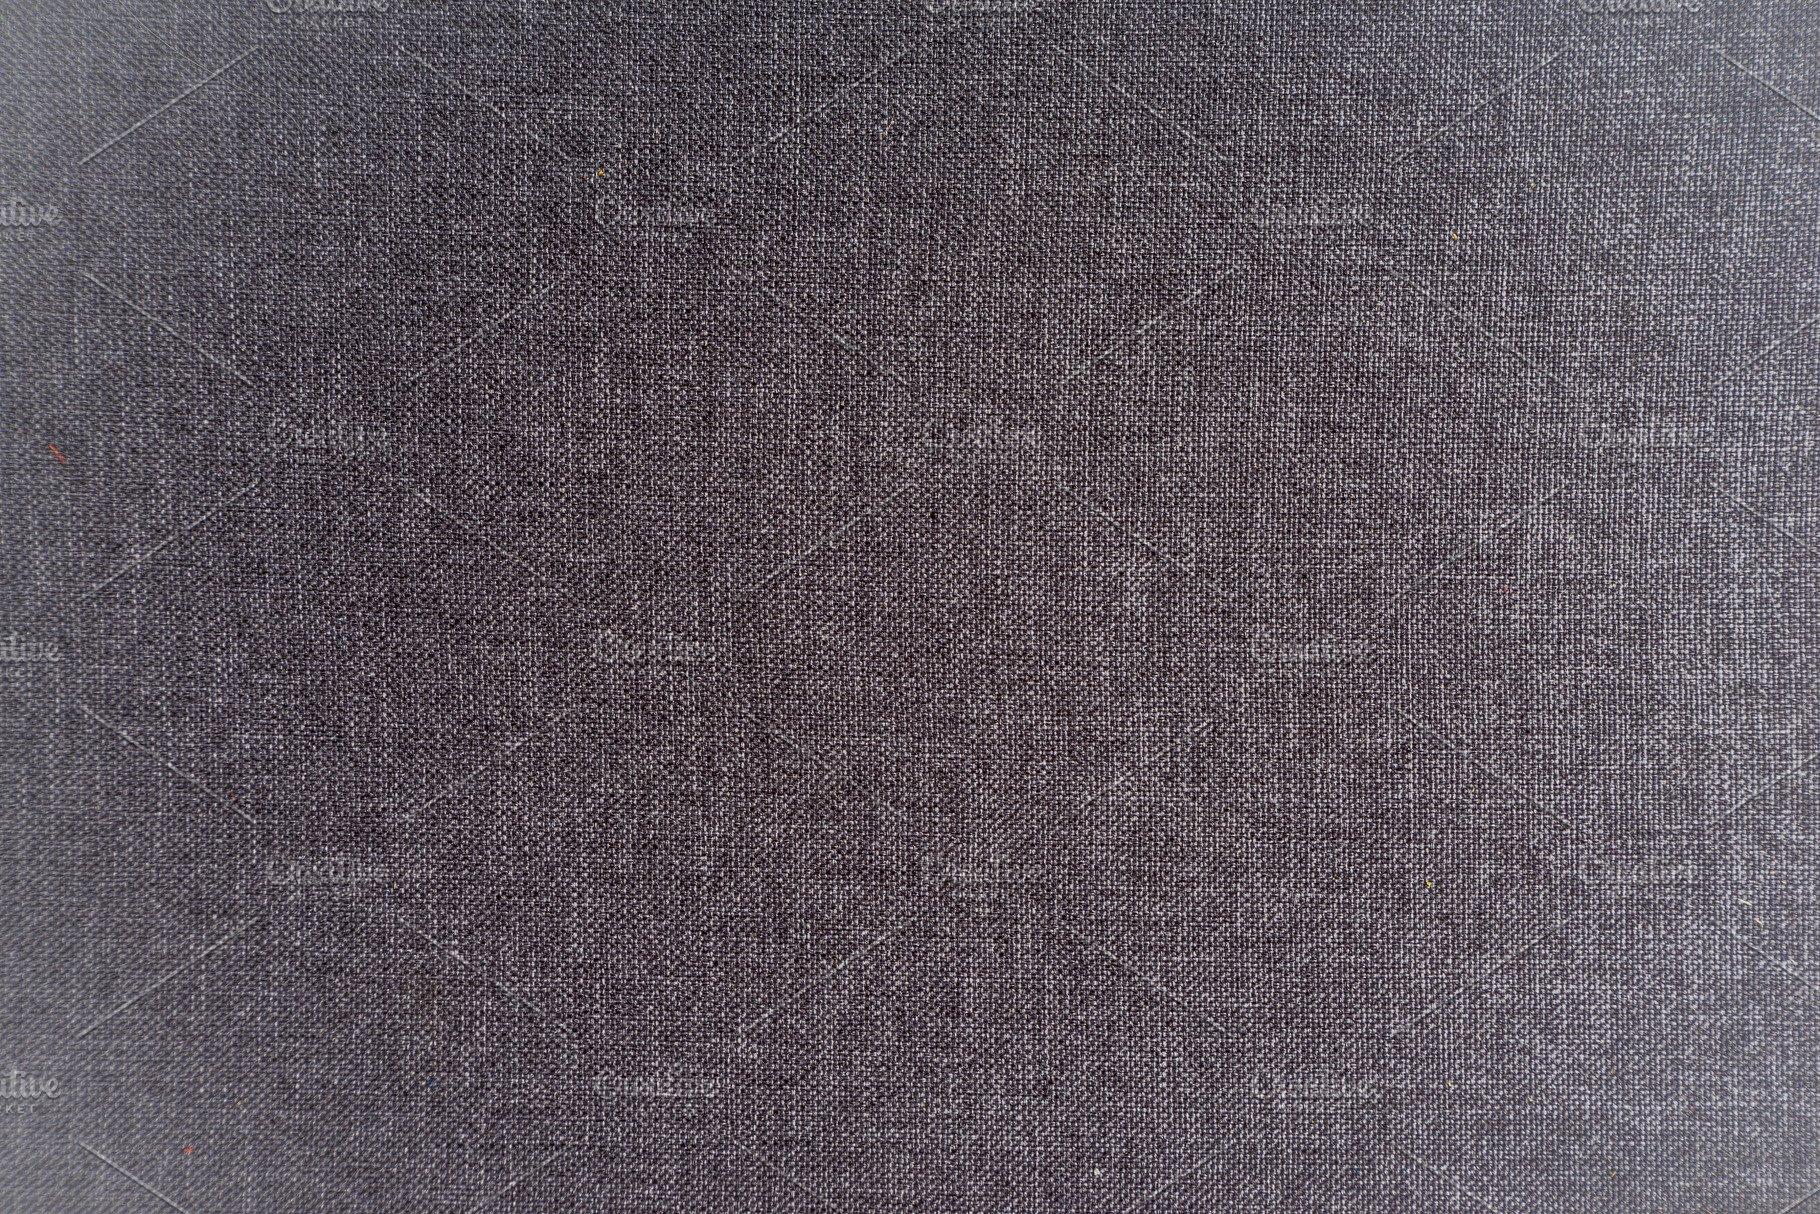 Linen fabric weaving background